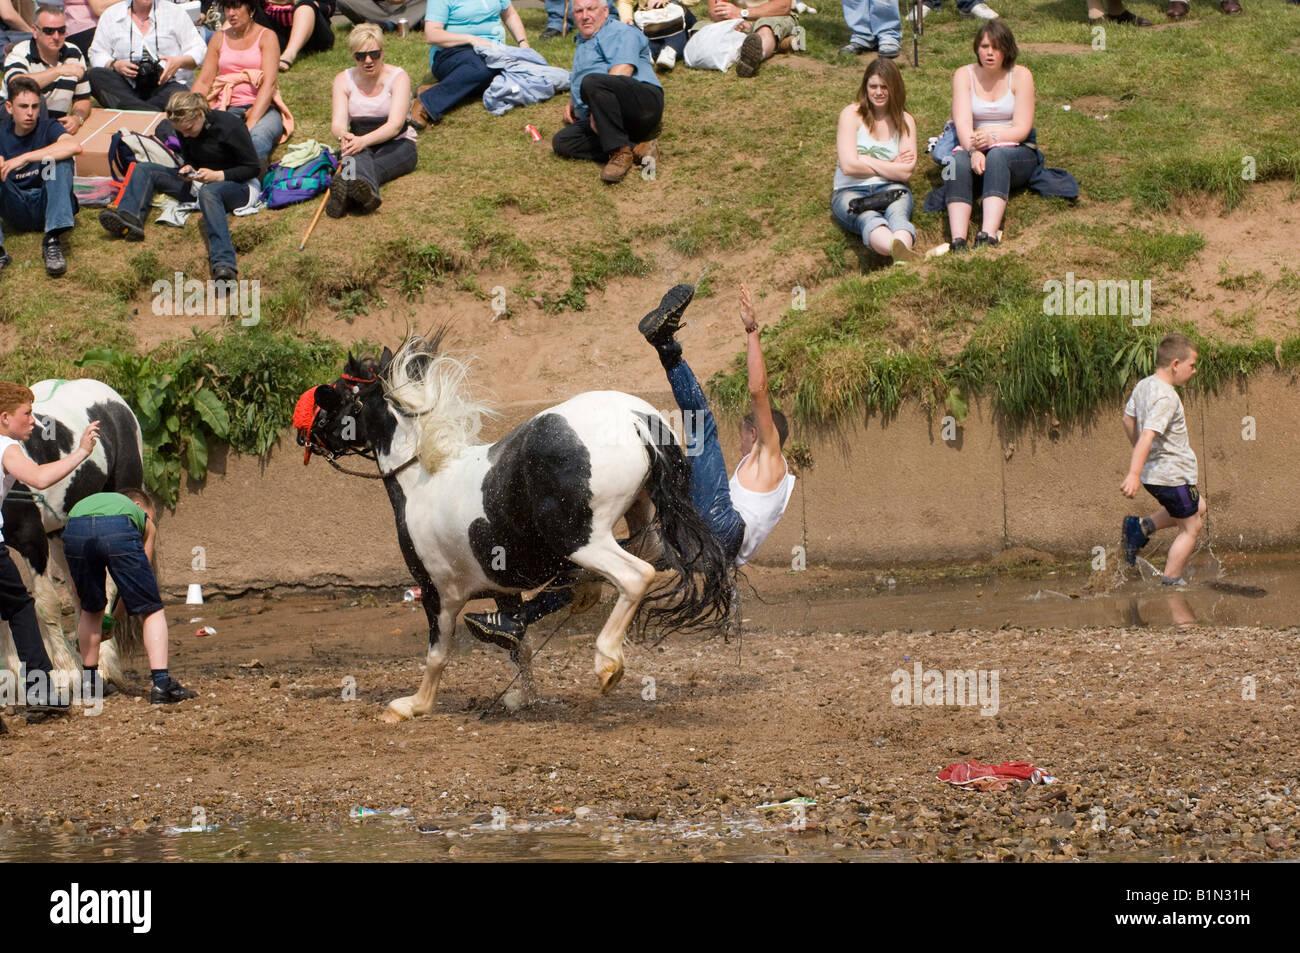 Gypsy Horse Fairs Stock Photos &amp- Gypsy Horse Fairs Stock Images ...